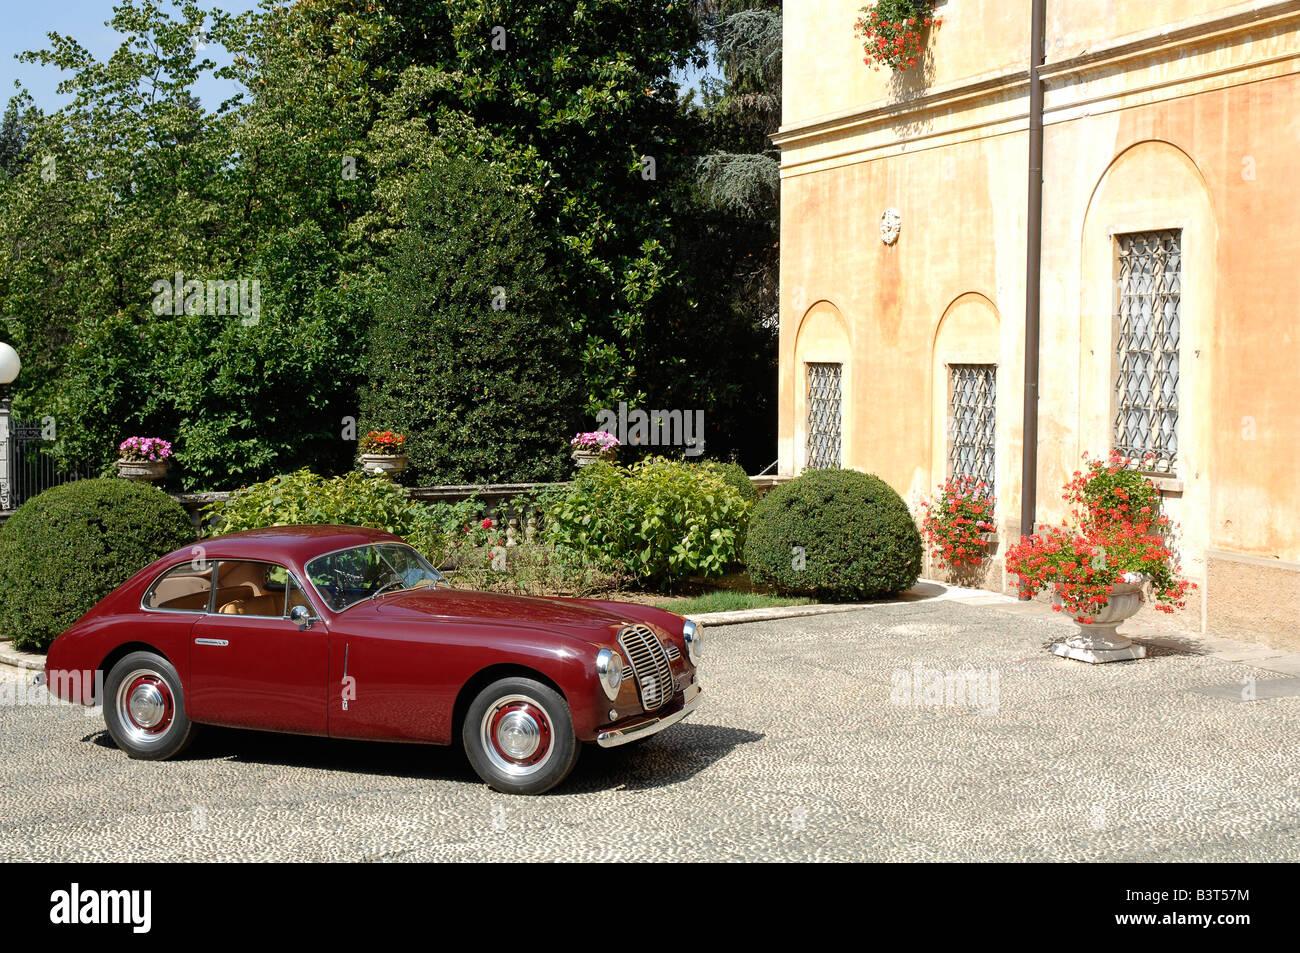 Maserati 1500 Grand Tourismo 1949 - Stock Image